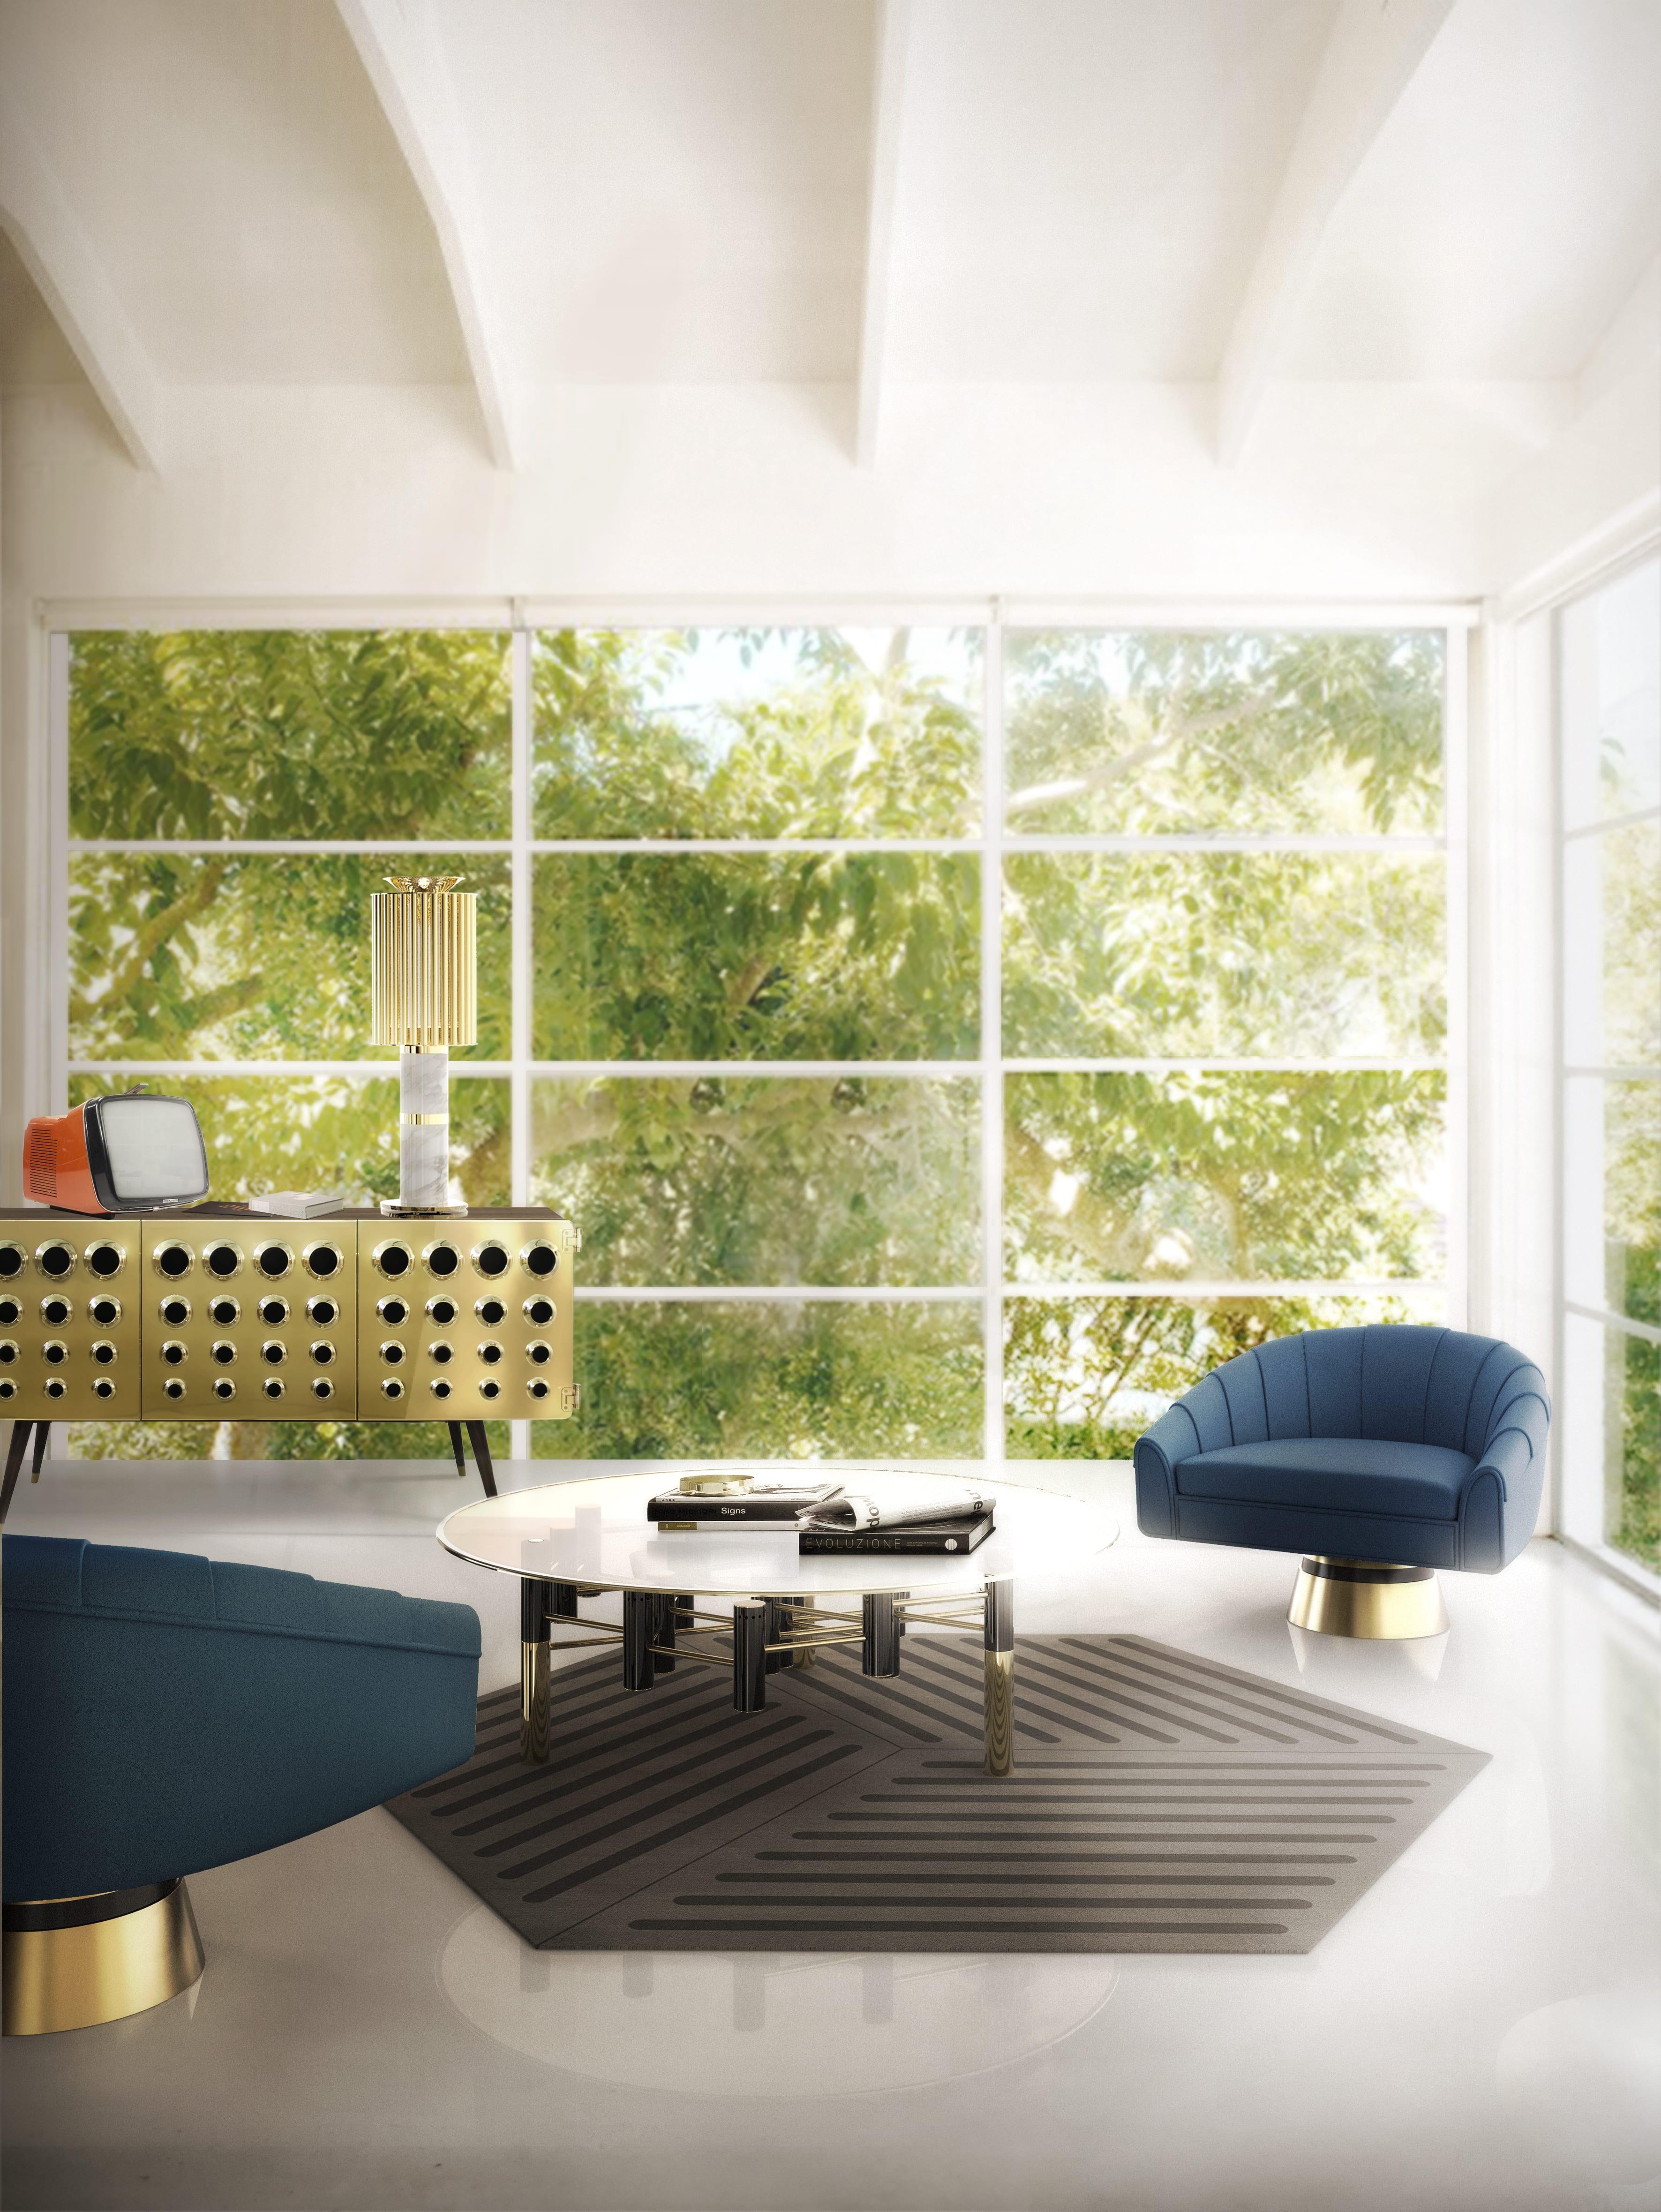 living room ideas Living Room Ideas For a Luxurious Interior Design Project Living Room Ideas For a Luxurious Interior Design Project 17 min